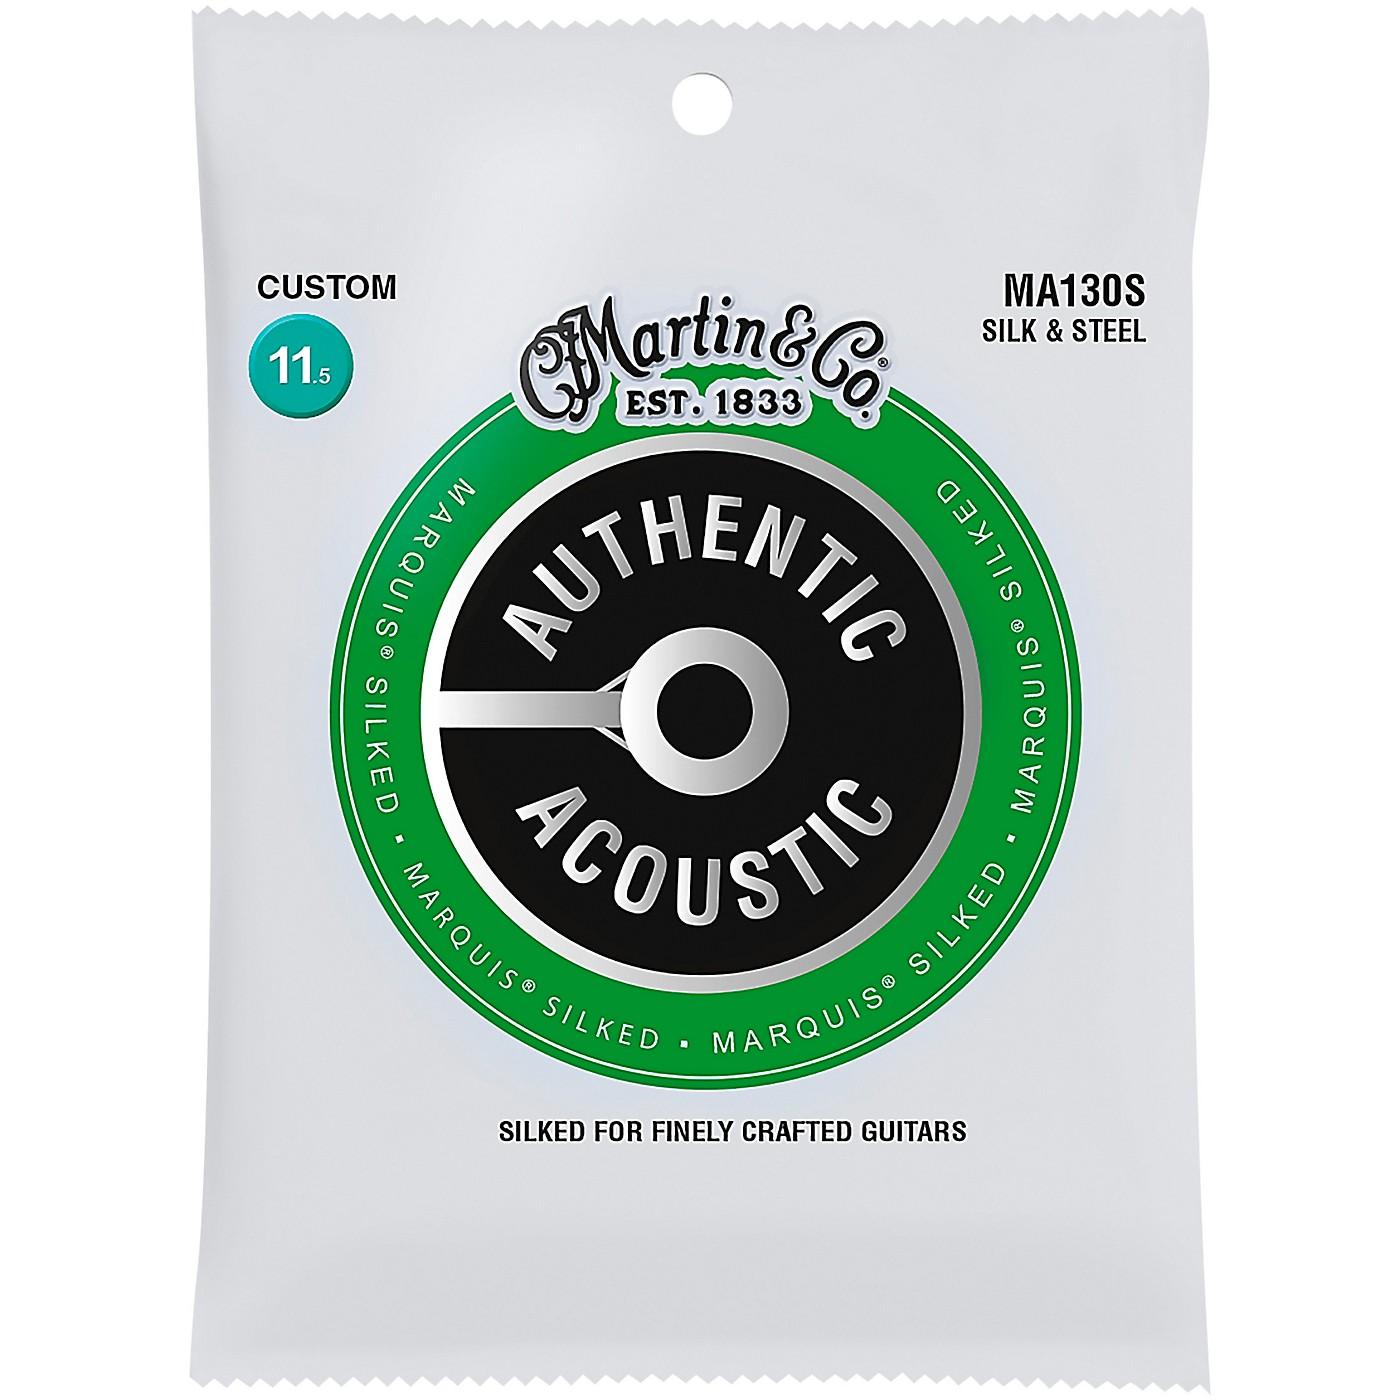 Martin MA130S Marquis Silk & Steel Custom Authentic Acoustic Guitar Strings thumbnail